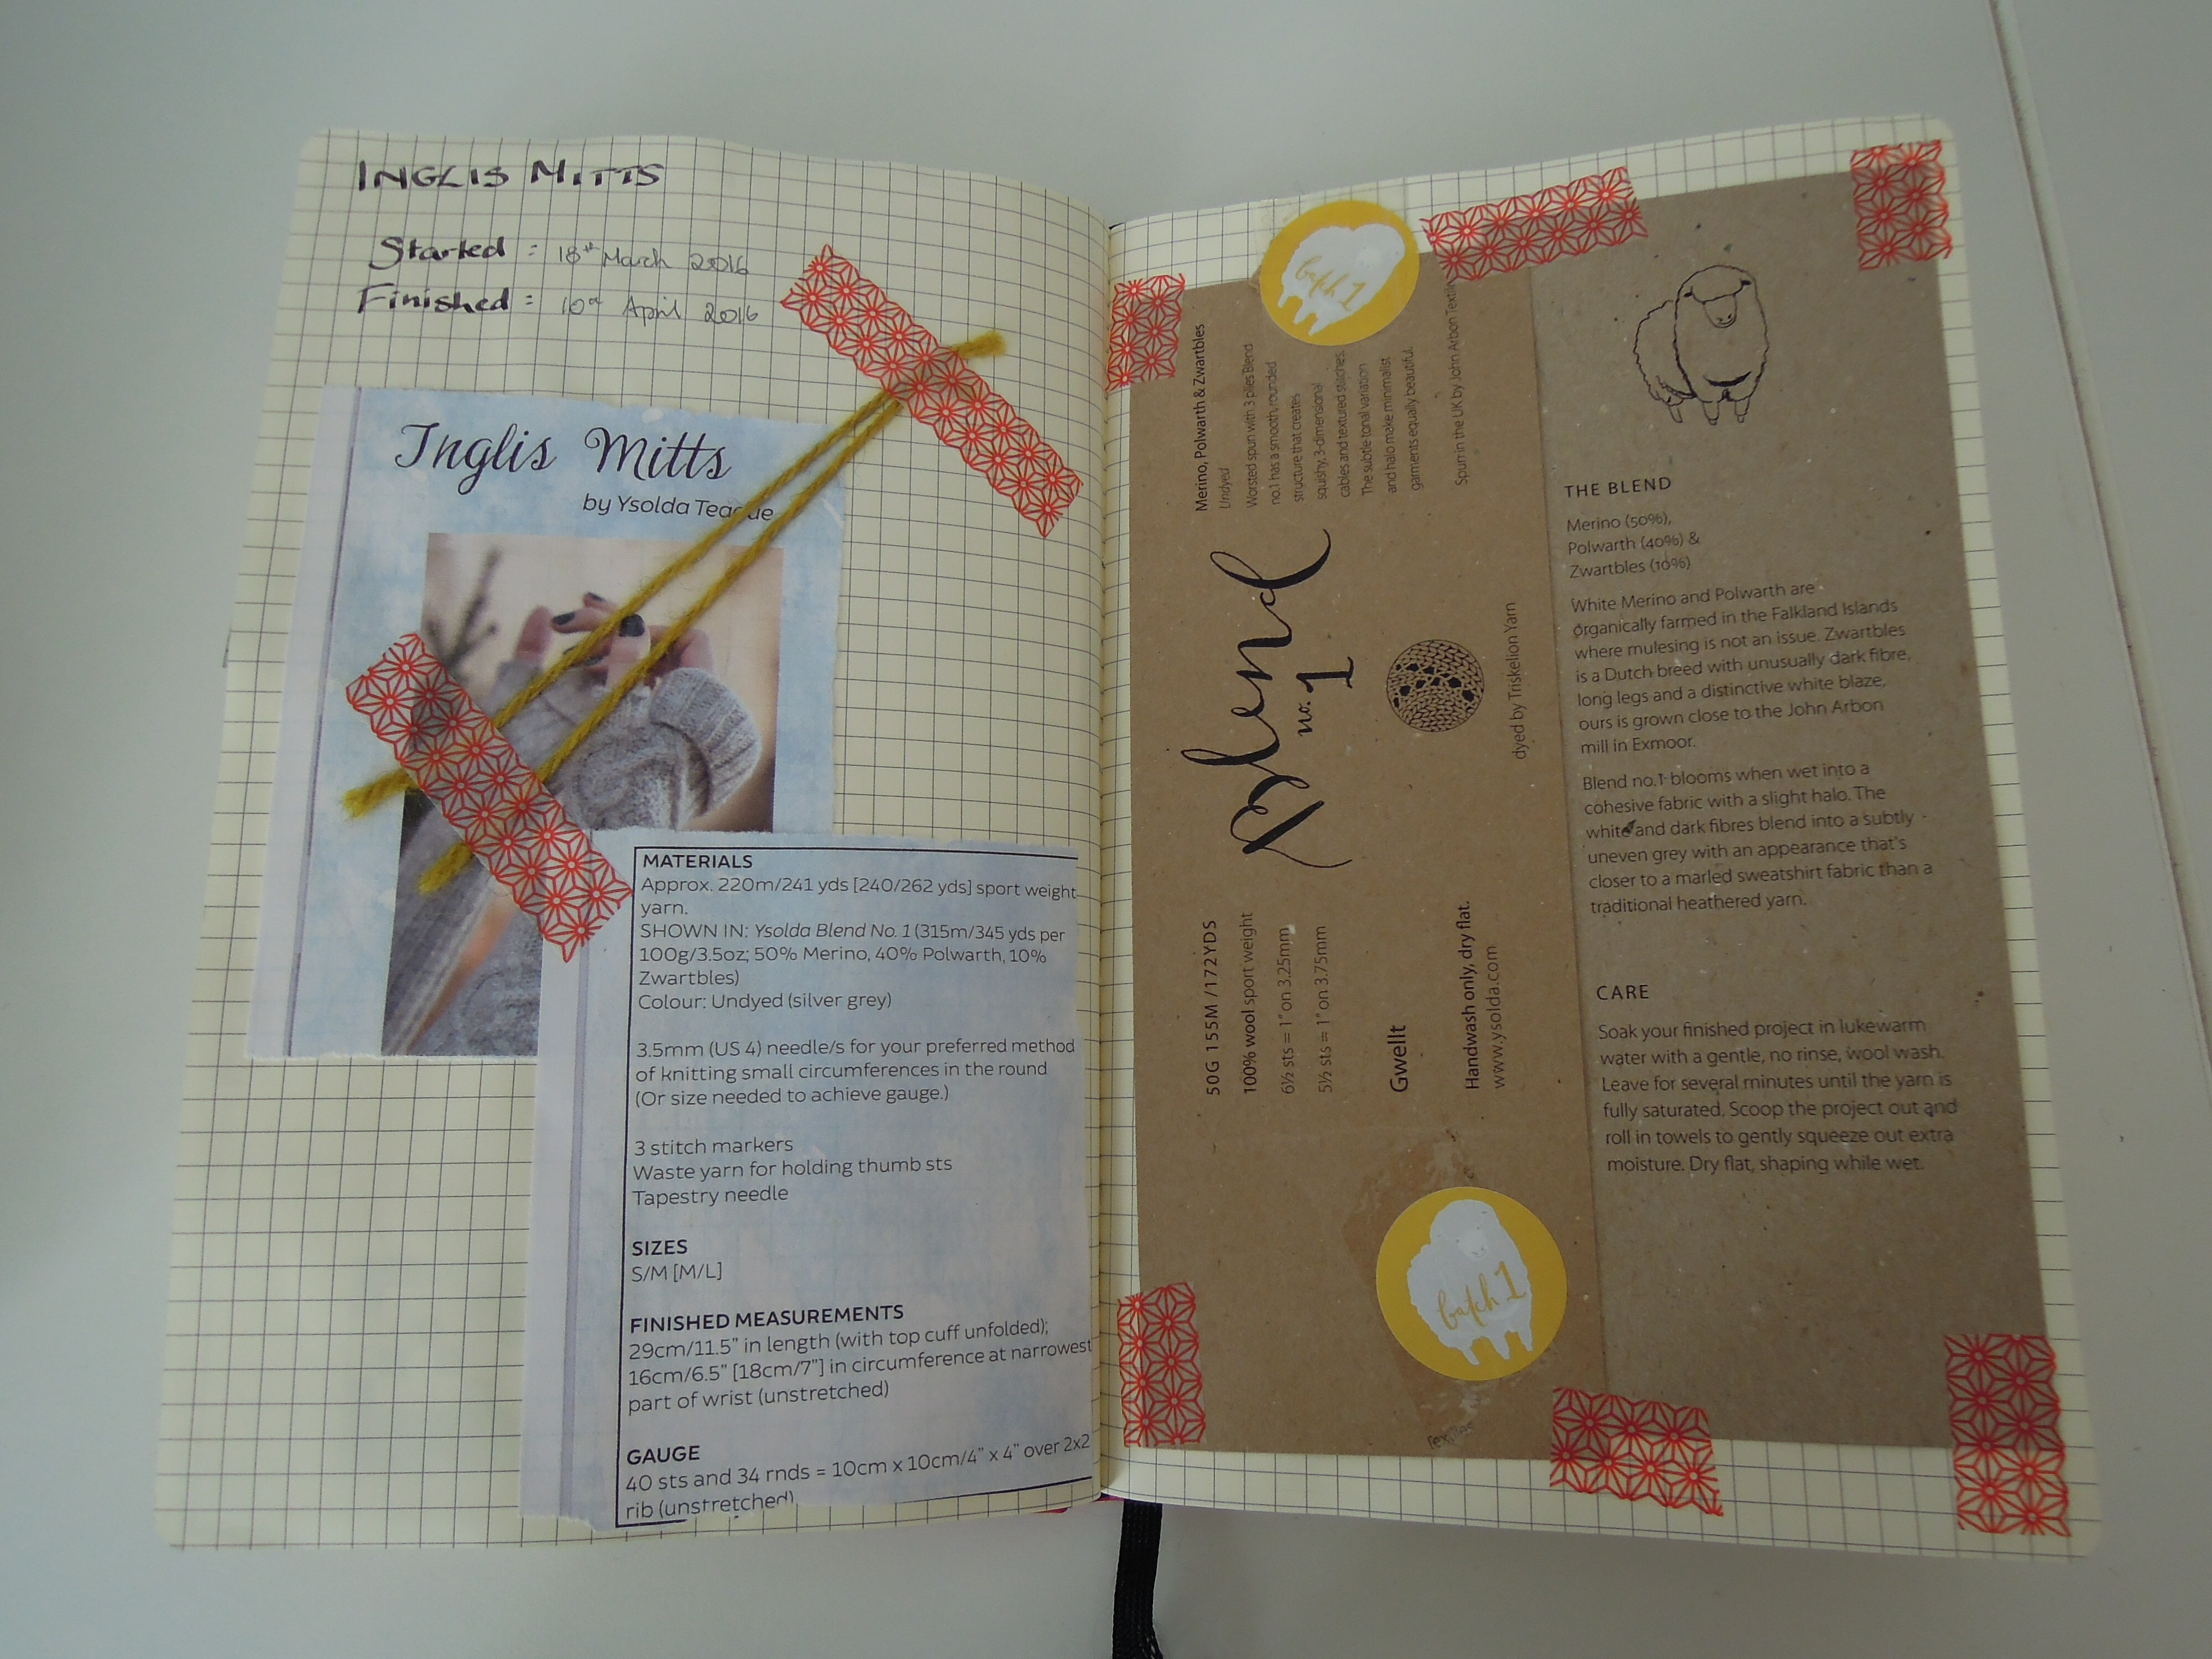 Knitting Project Journal : My knitting journals woolly originals